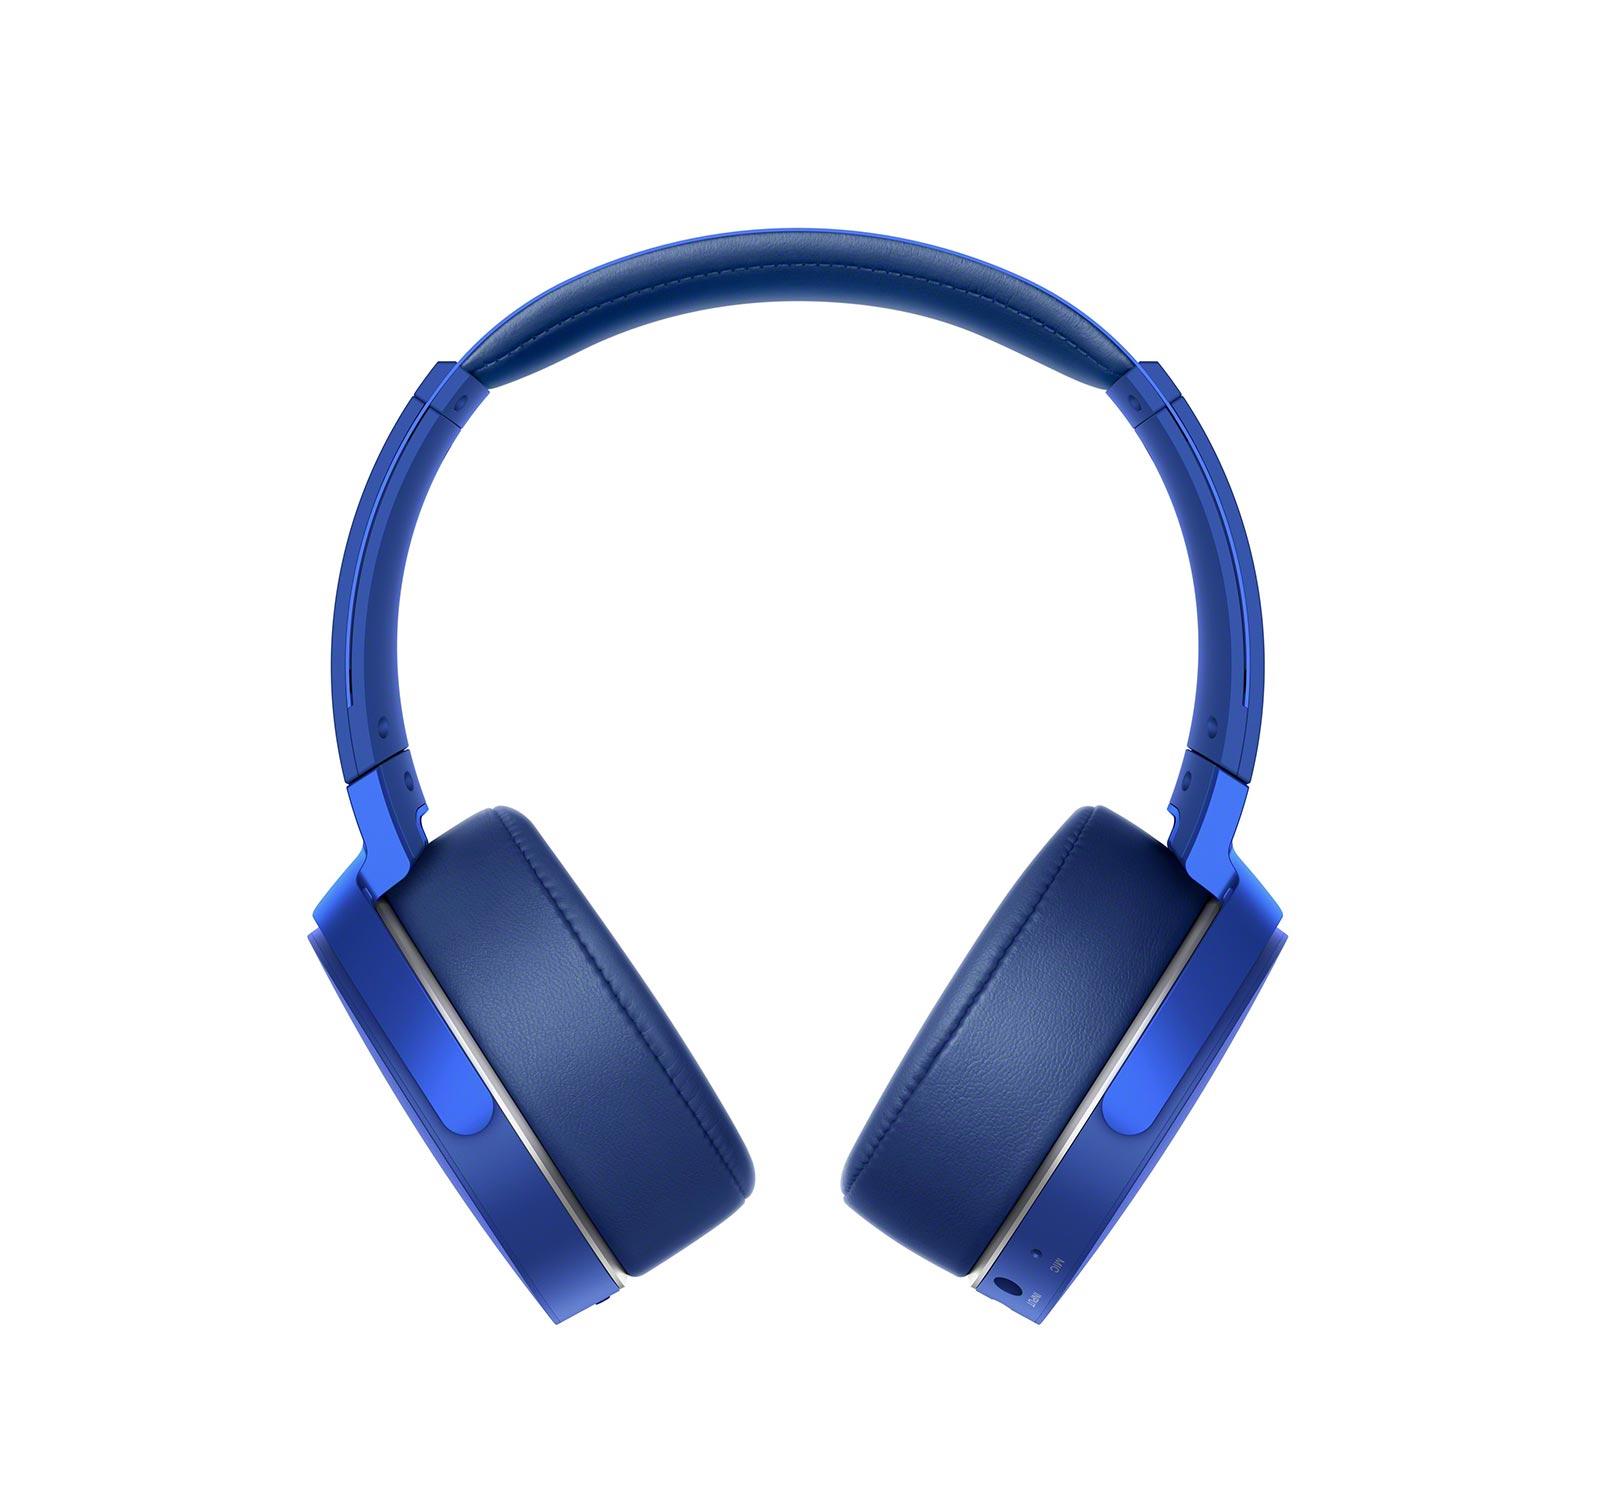 Sony-MDRXB950B1-L-Blue-Over-ear-Bluetooth-Headphones thumbnail 3